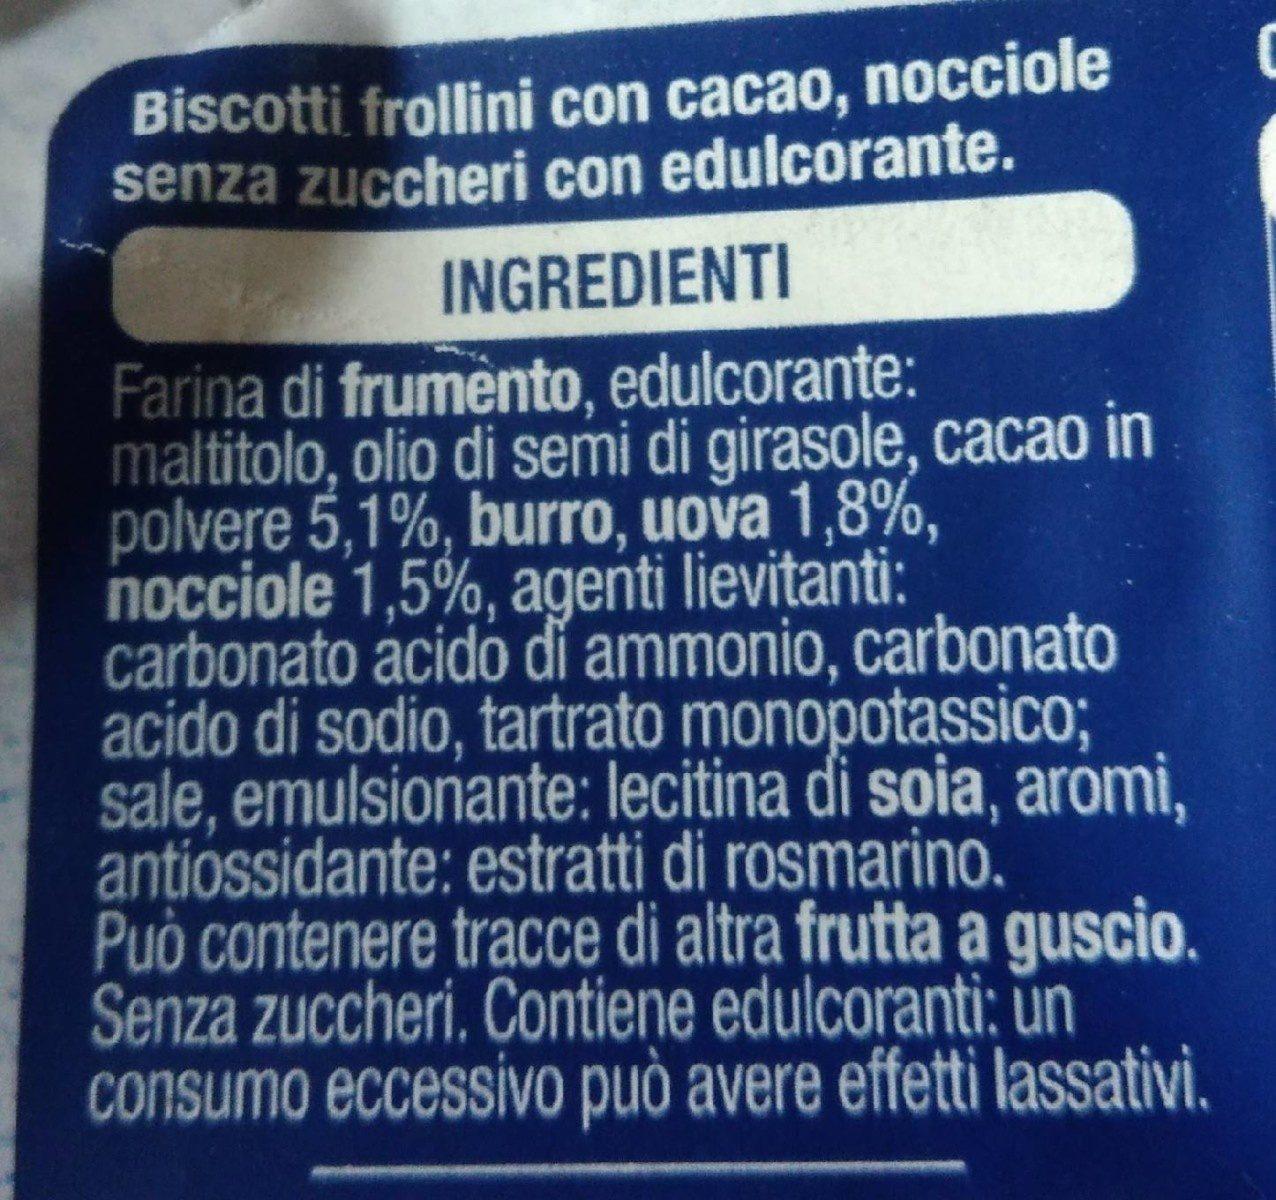 Biscotti con cacao e nocciole senza zuccheri - Ingrédients - fr